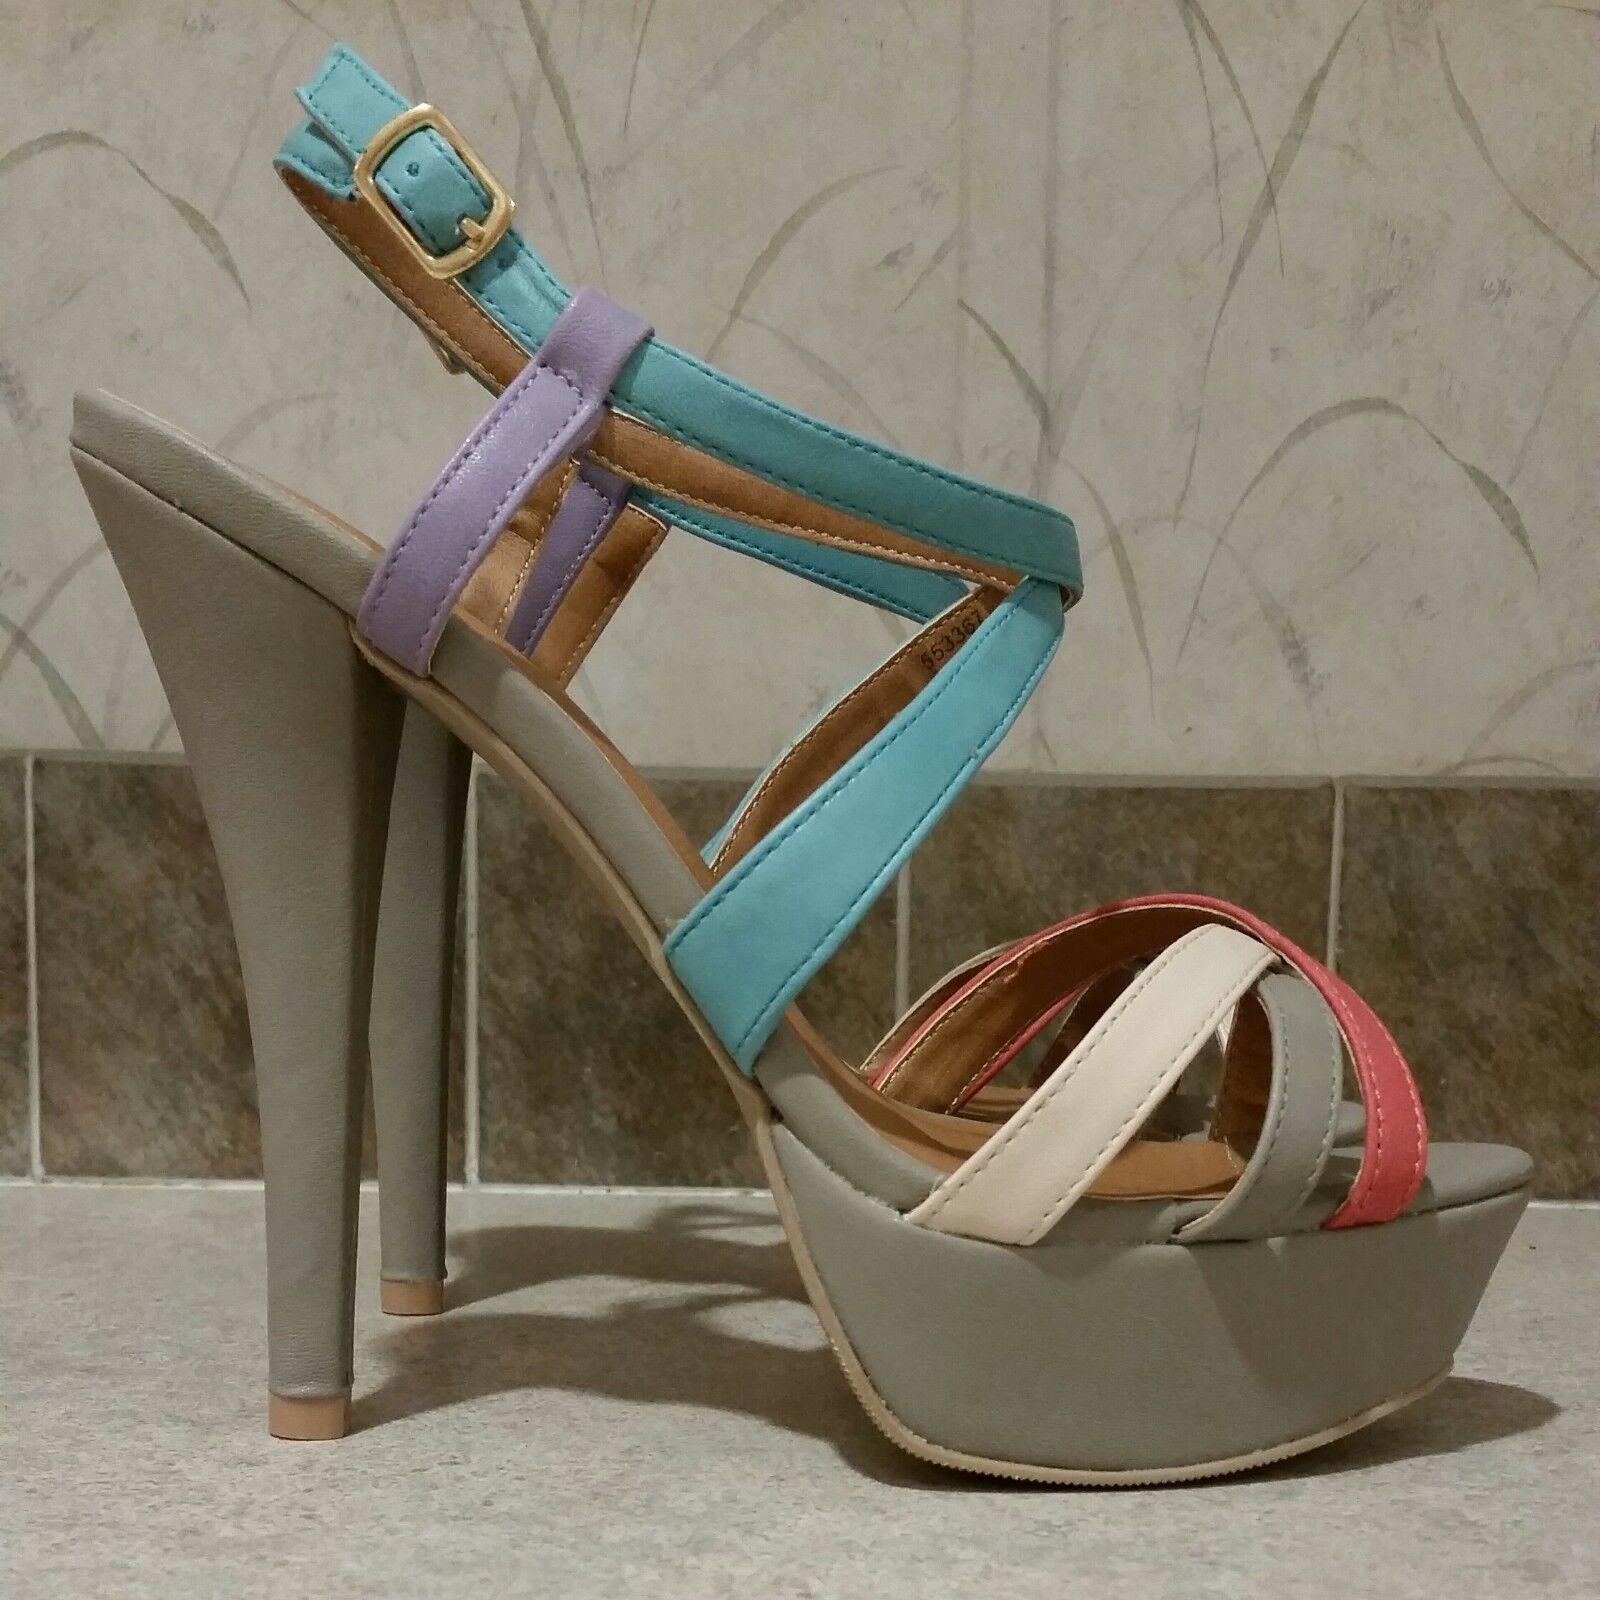 CHARLOTTE RUSSE Chance-42 Taupe Combo Couleur Straps Platform Stiletto Sandals 8